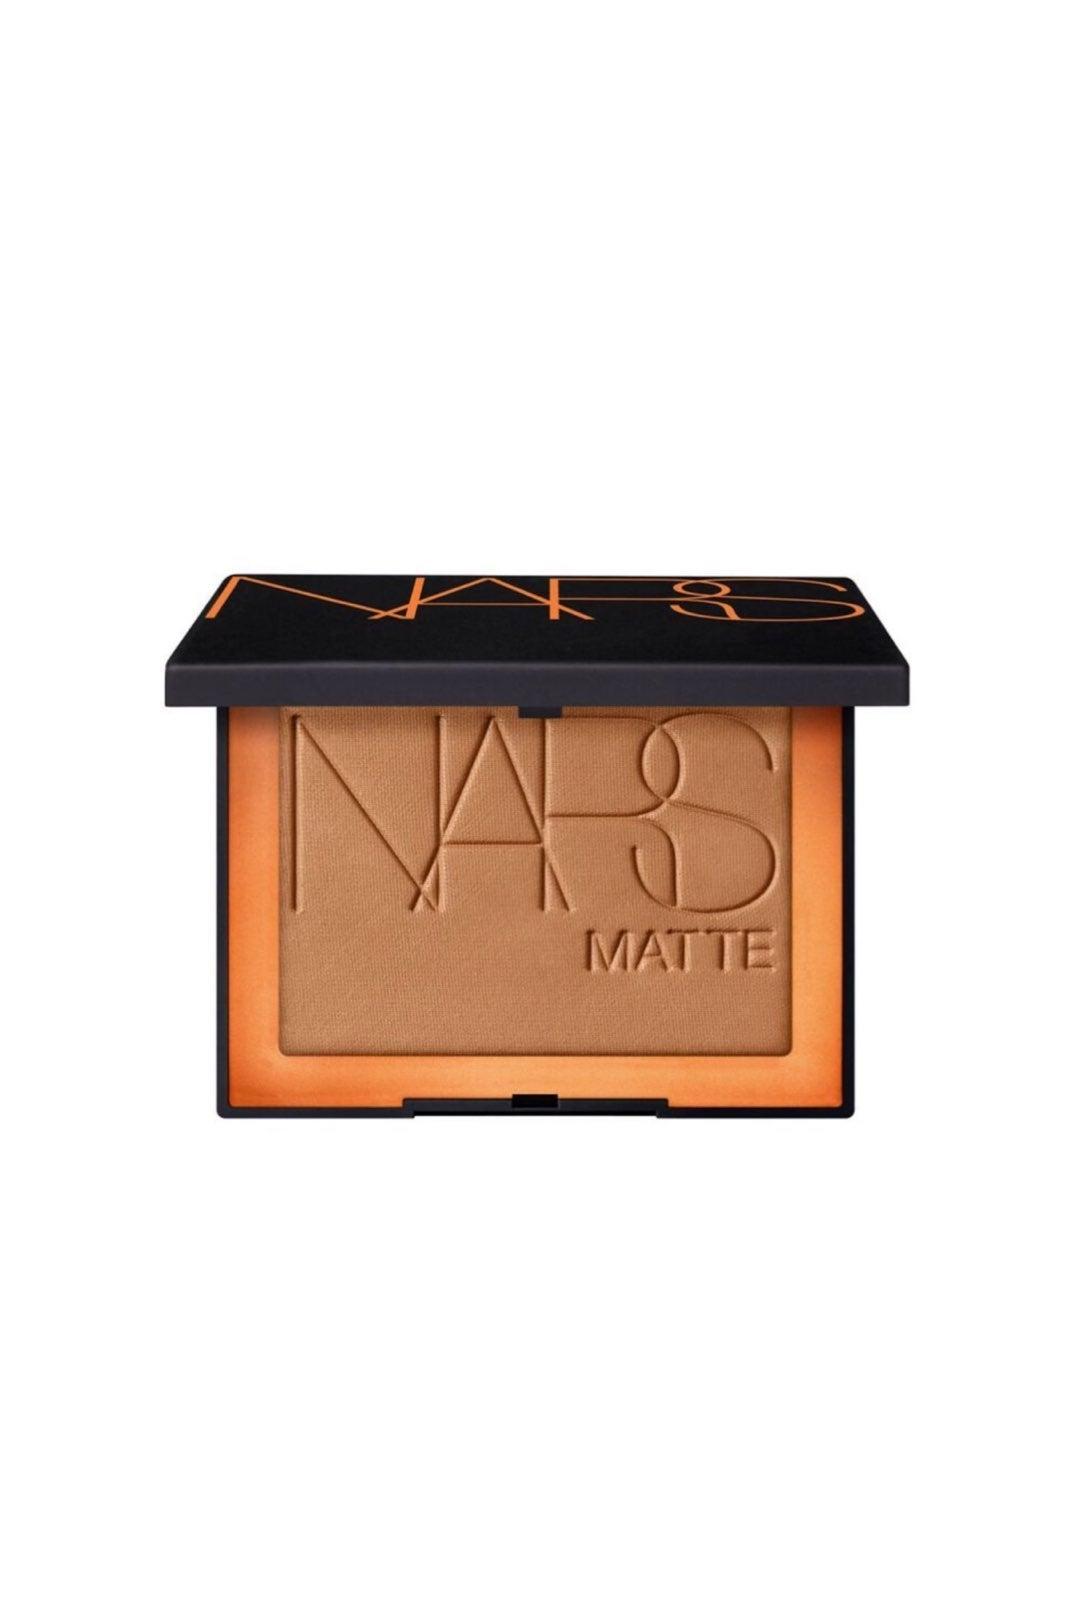 New NARS Matte Laguna Bronzer-Full Size